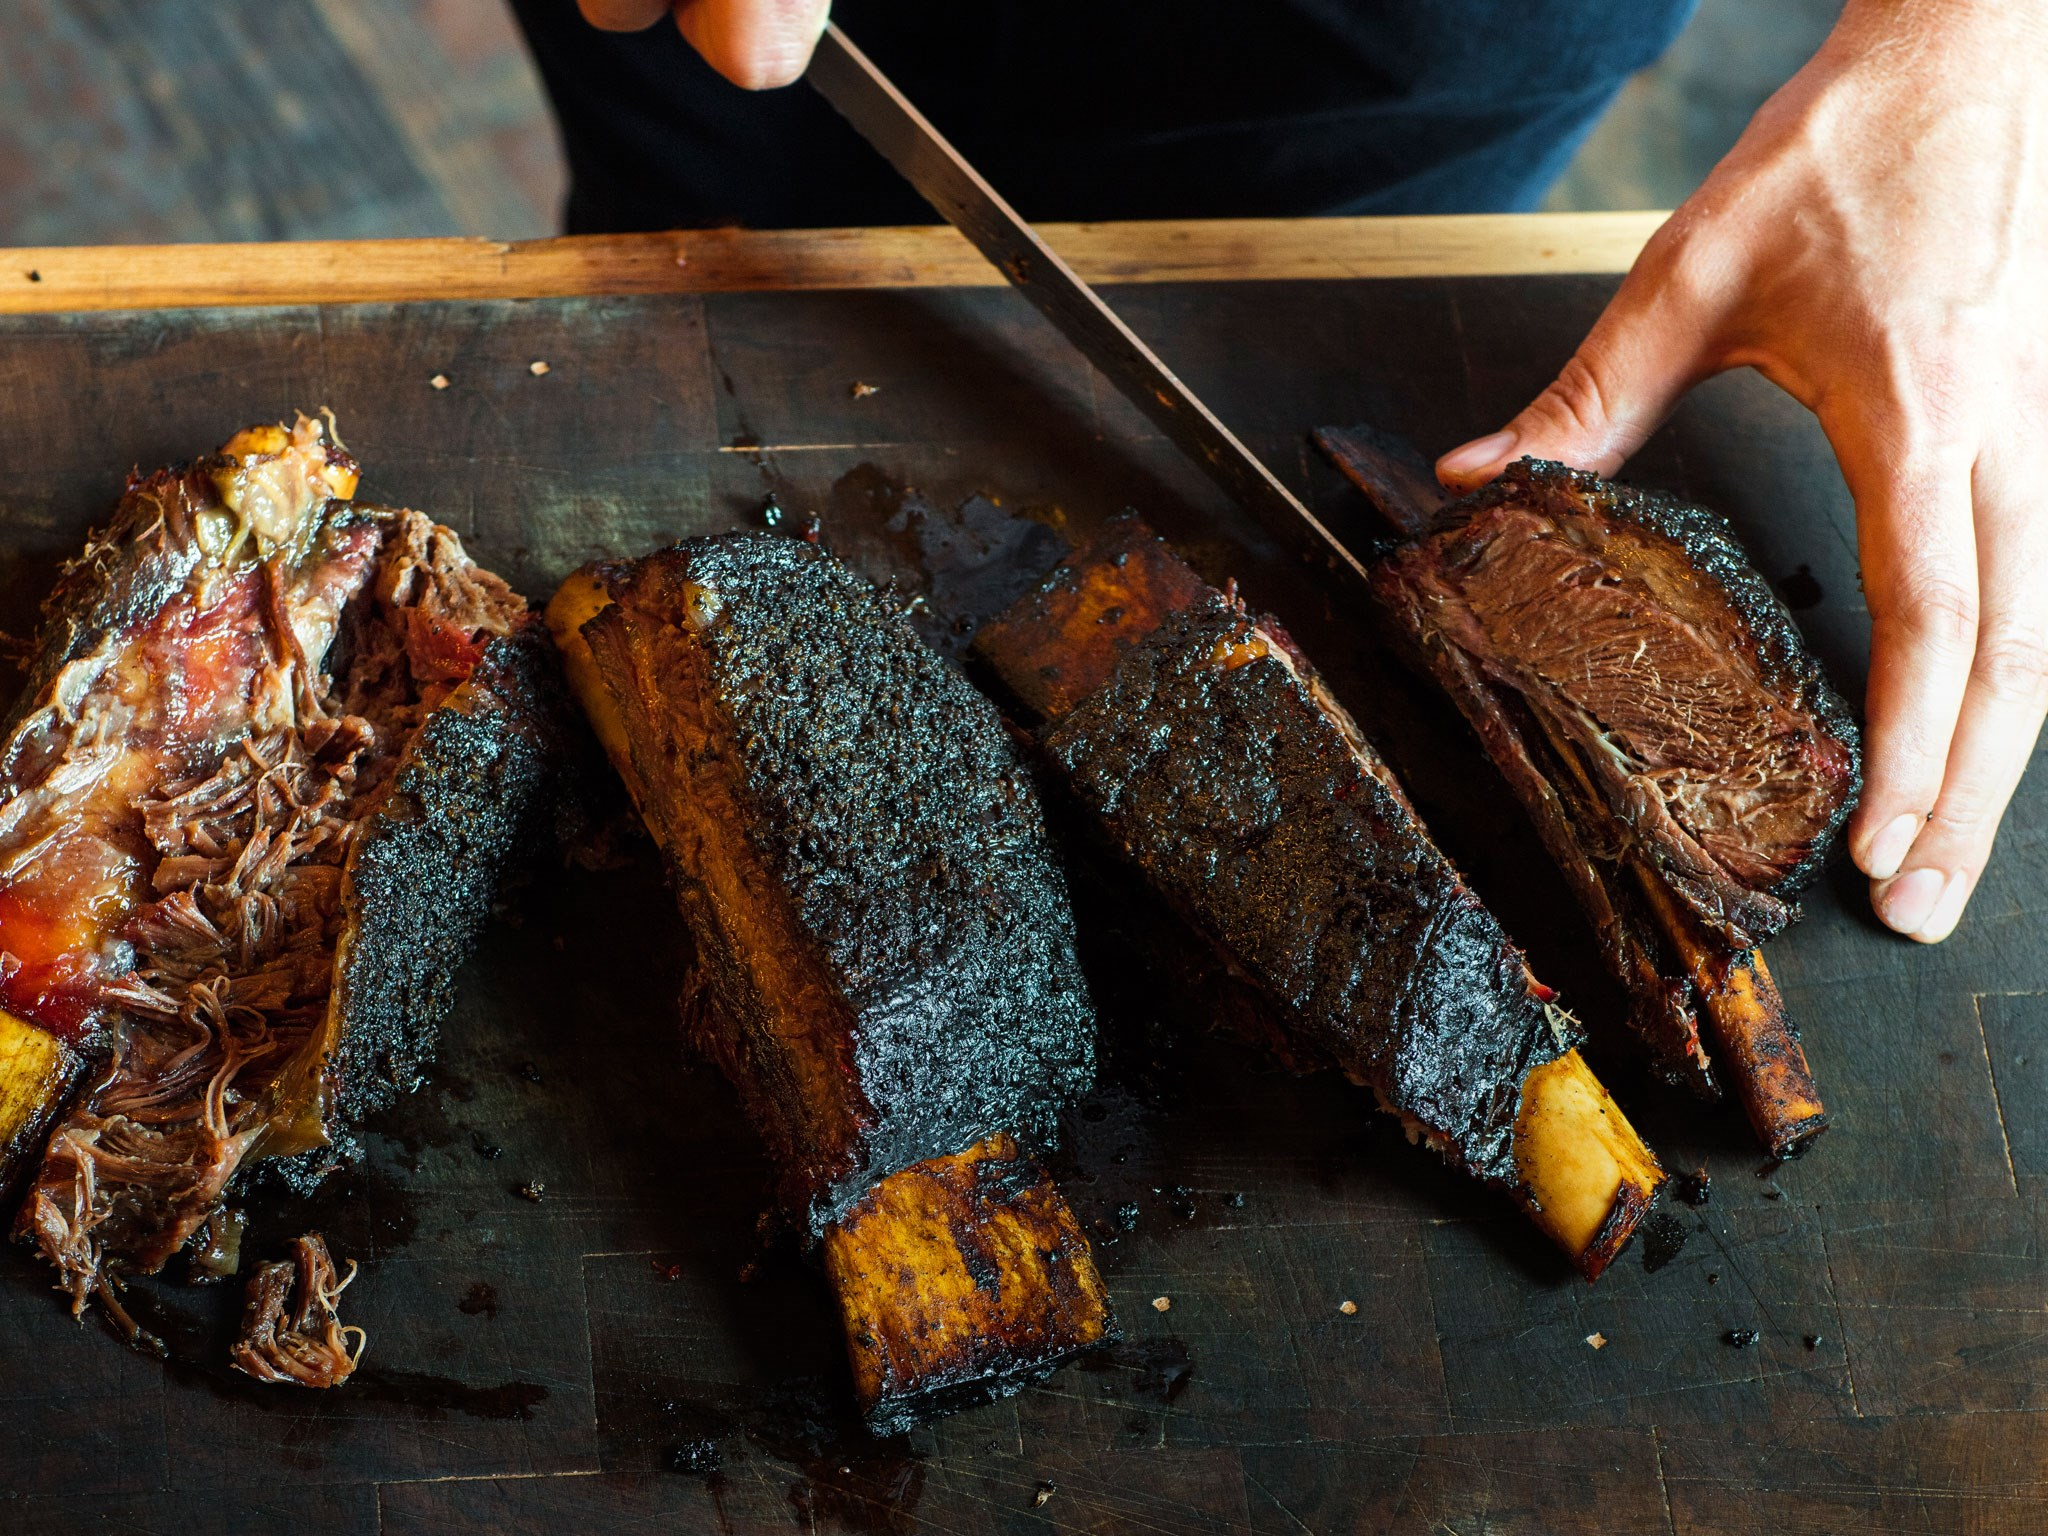 [Beef short ribs with smoked-bone sauce.](http://www.foodtolove.co.nz/recipes/beef-short-ribs-with-smoked-bone-sauce-35845)